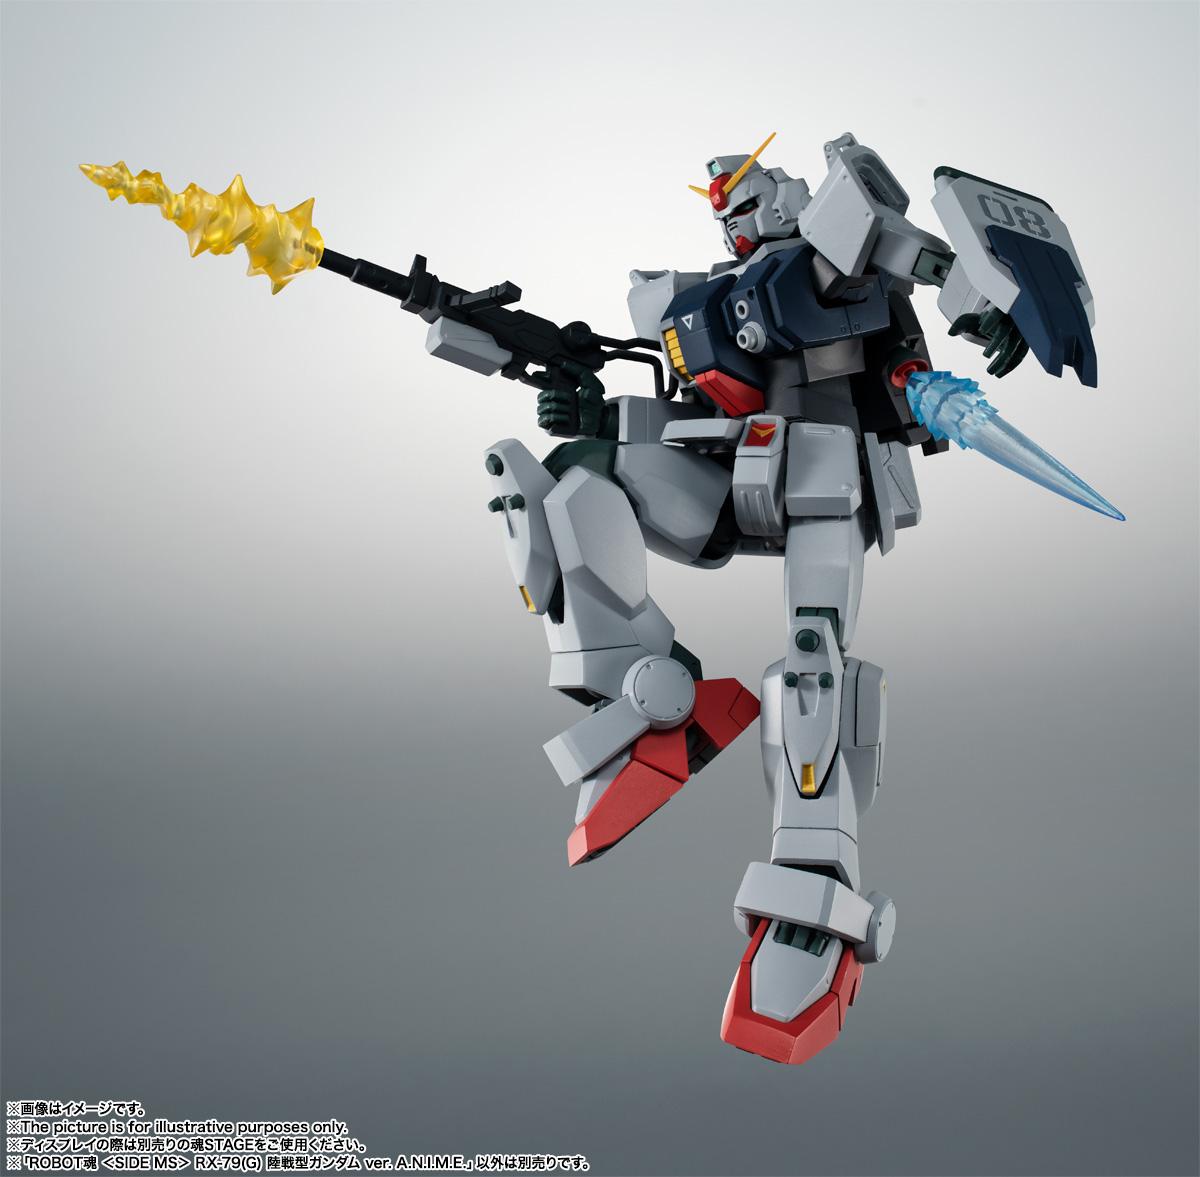 ROBOT魂〈SIDE MS〉『RX-79(G)陸戦型ガンダム ver. A.N.I.M.E.』機動戦士ガンダム 第08MS小隊 可動フィギュア-012